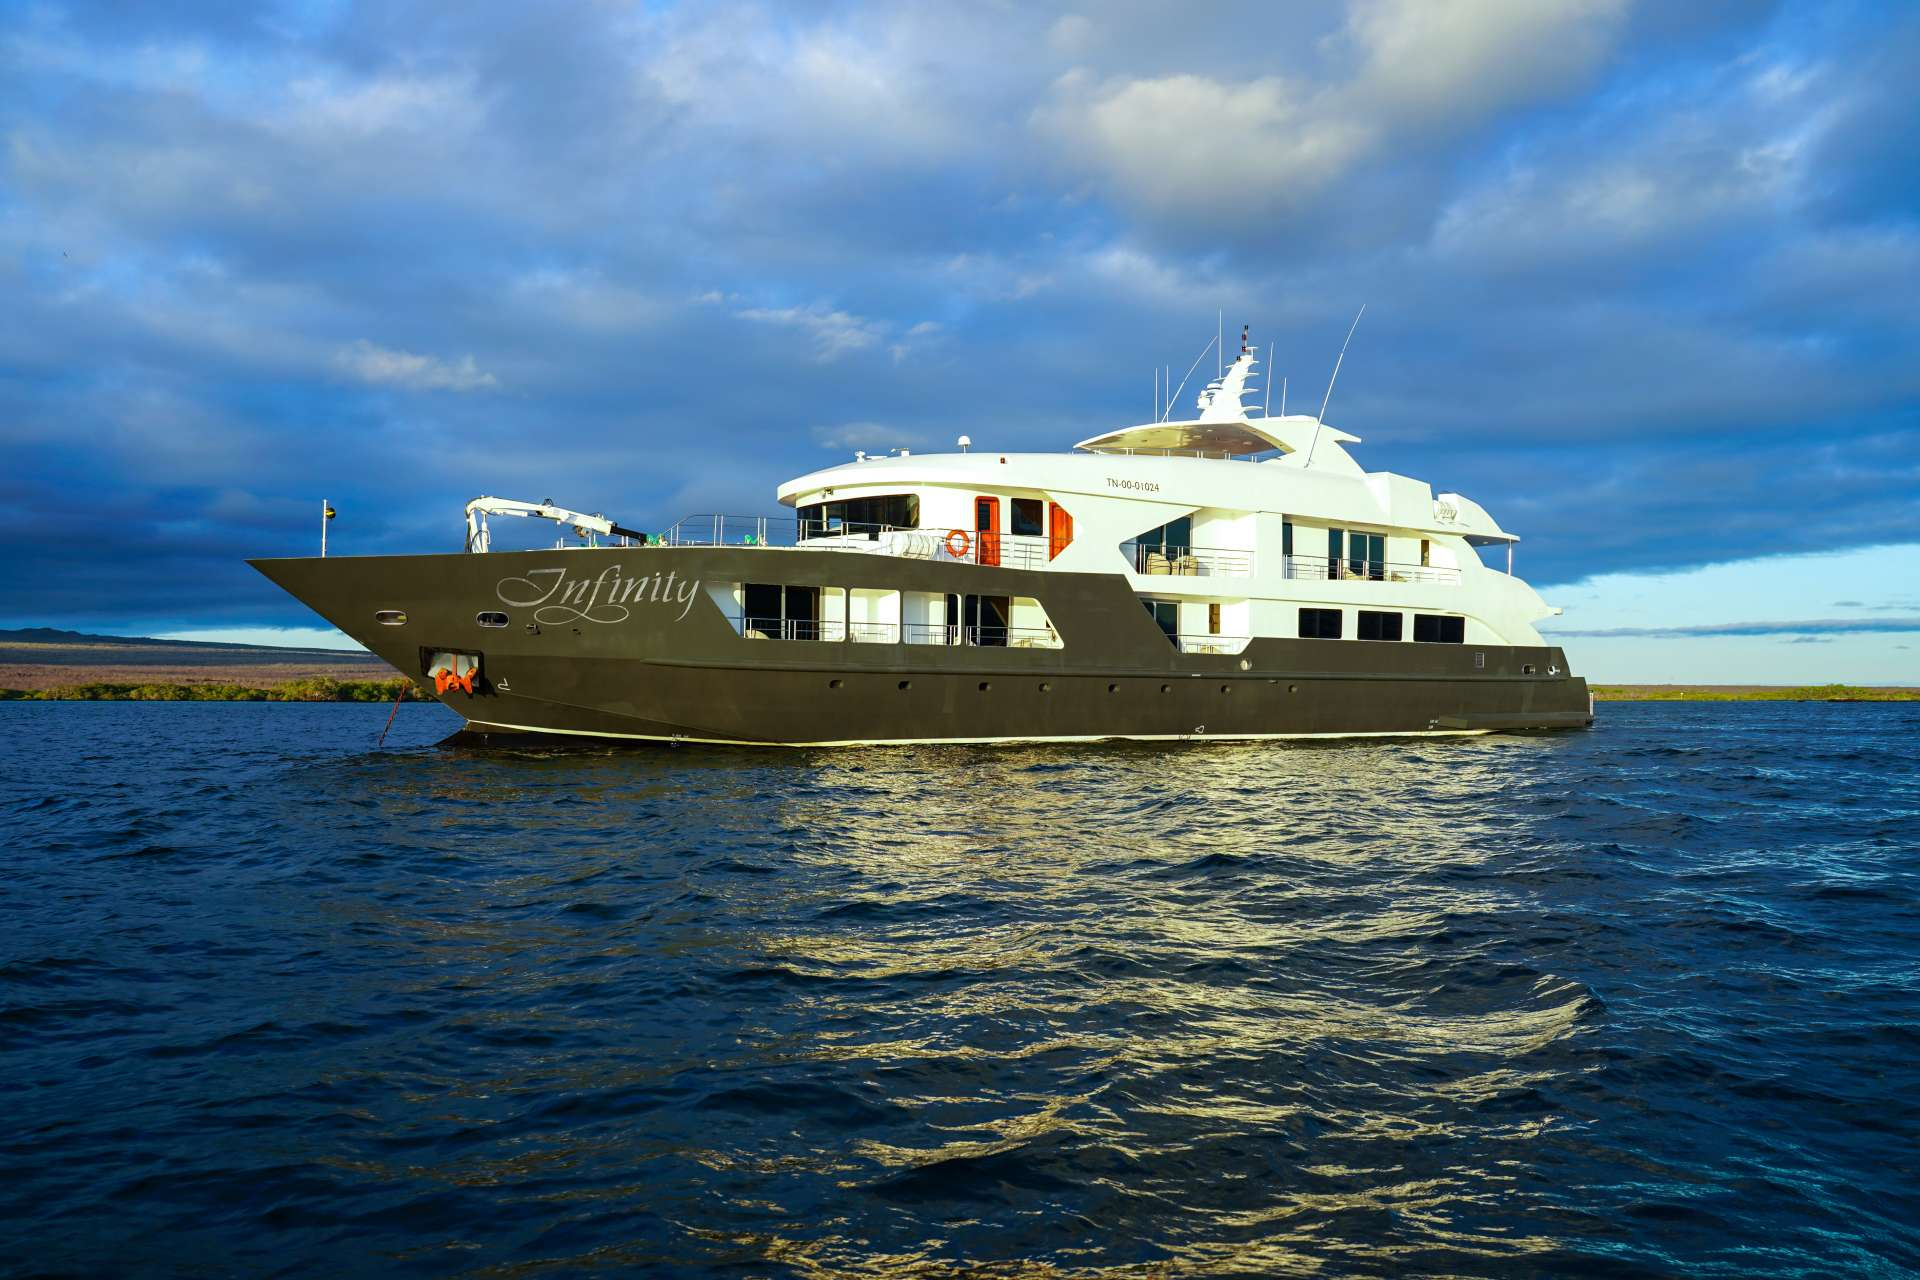 Power Yacht 'Power', 20 PAX, 10 Crew, 161.00 Ft, 49.00 Meters, Built 2018, ., Refit Year